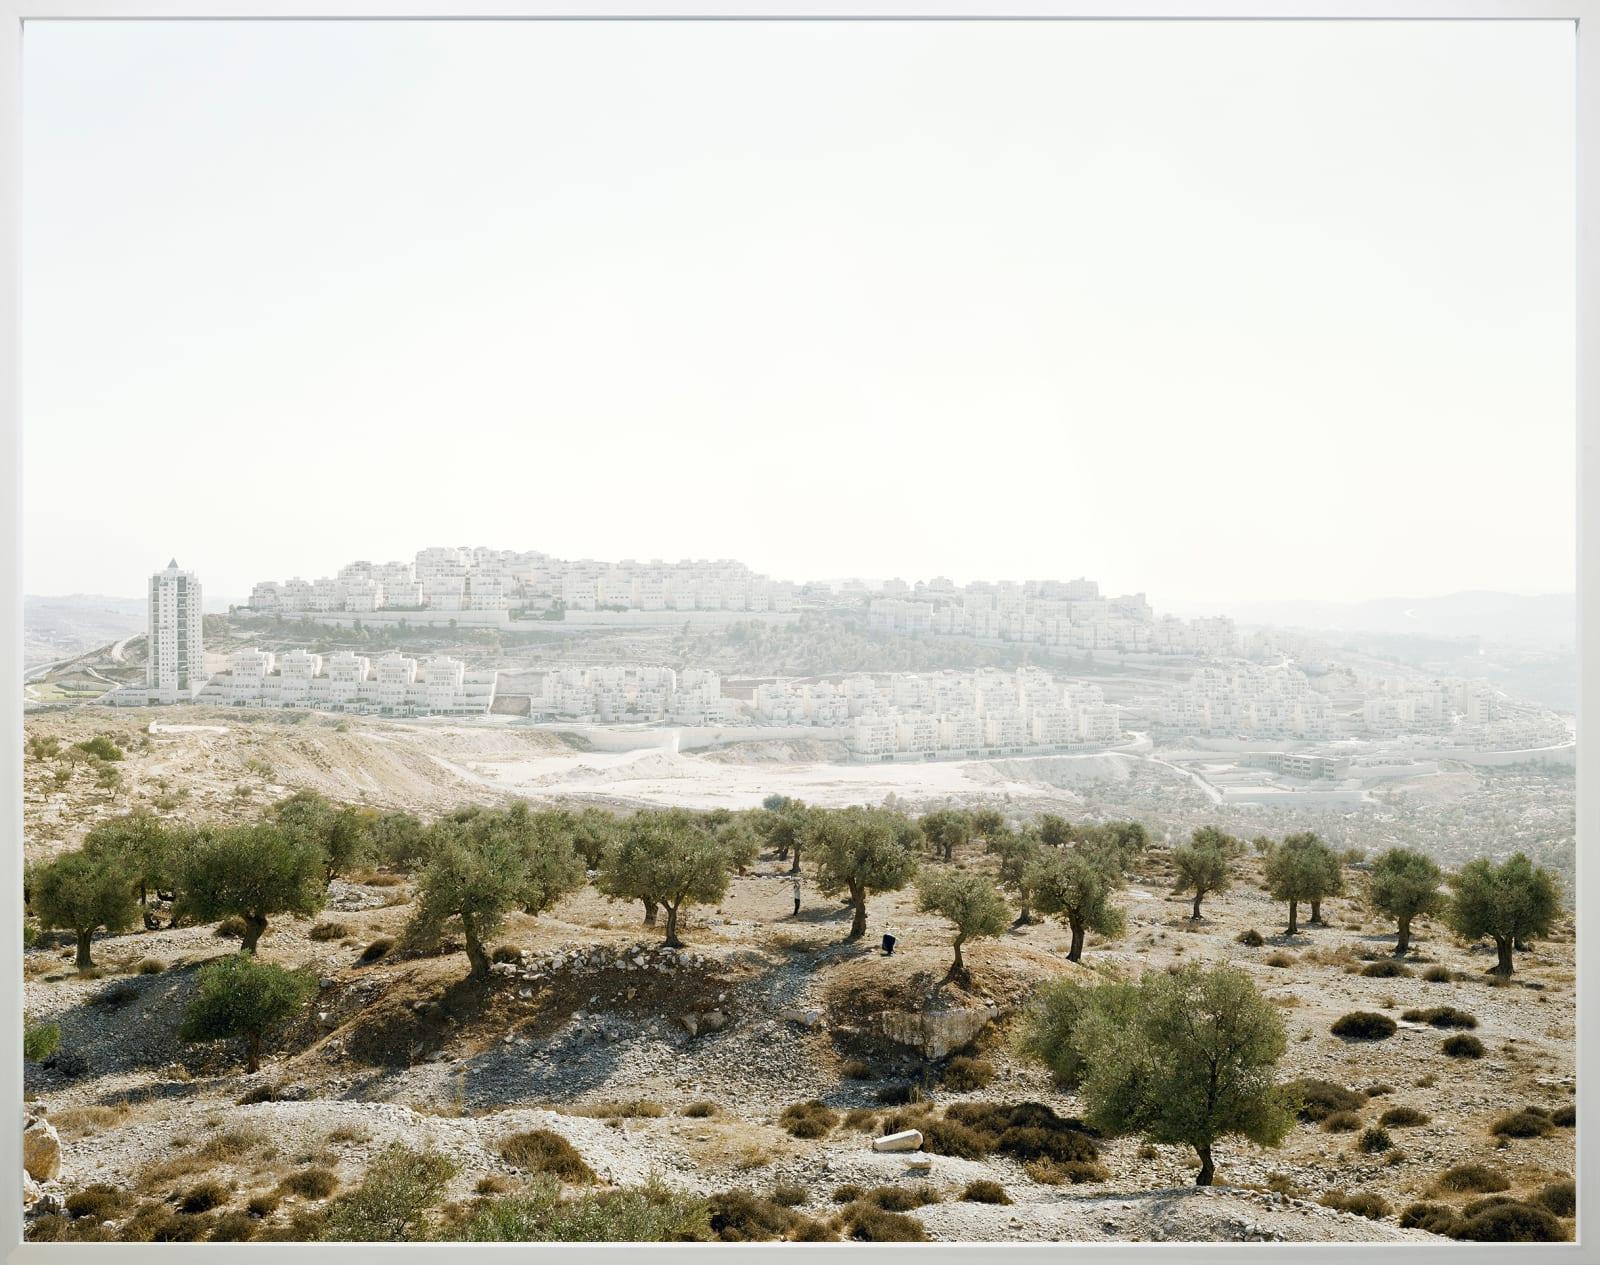 Francesco Jodice, What We Want, Bethlehem, T62, 2010